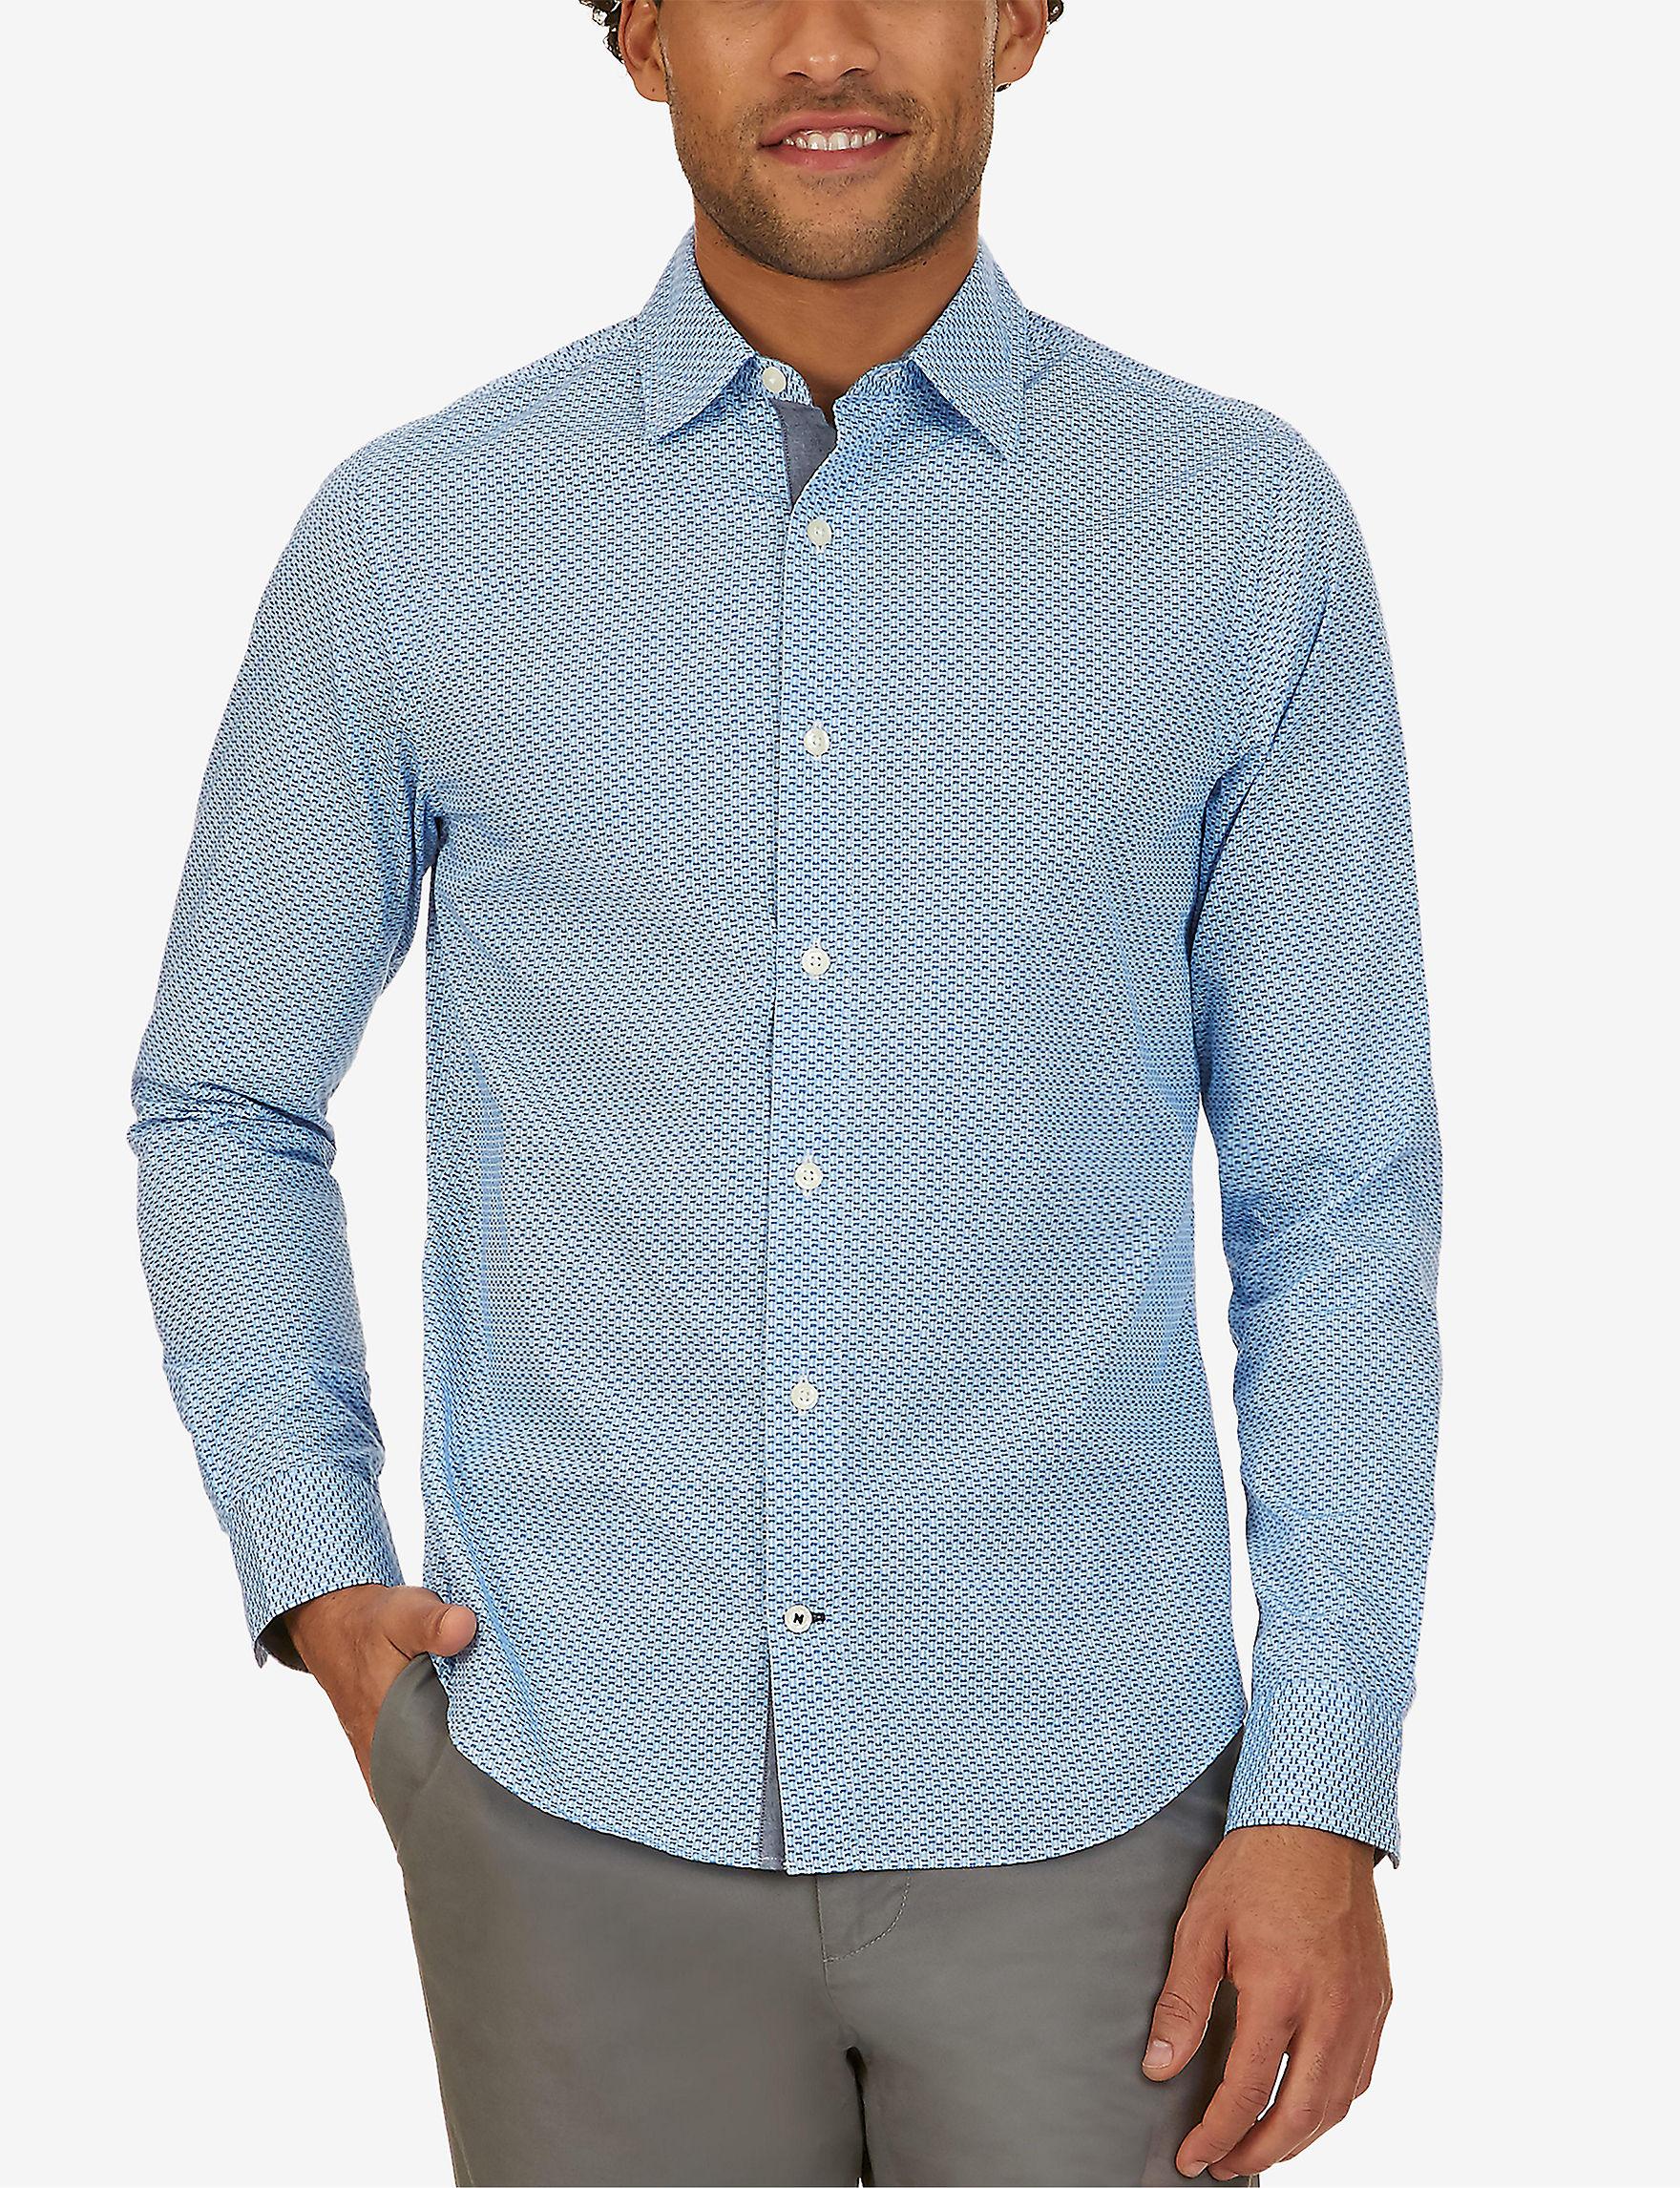 Nautica Ocean Casual Button Down Shirts